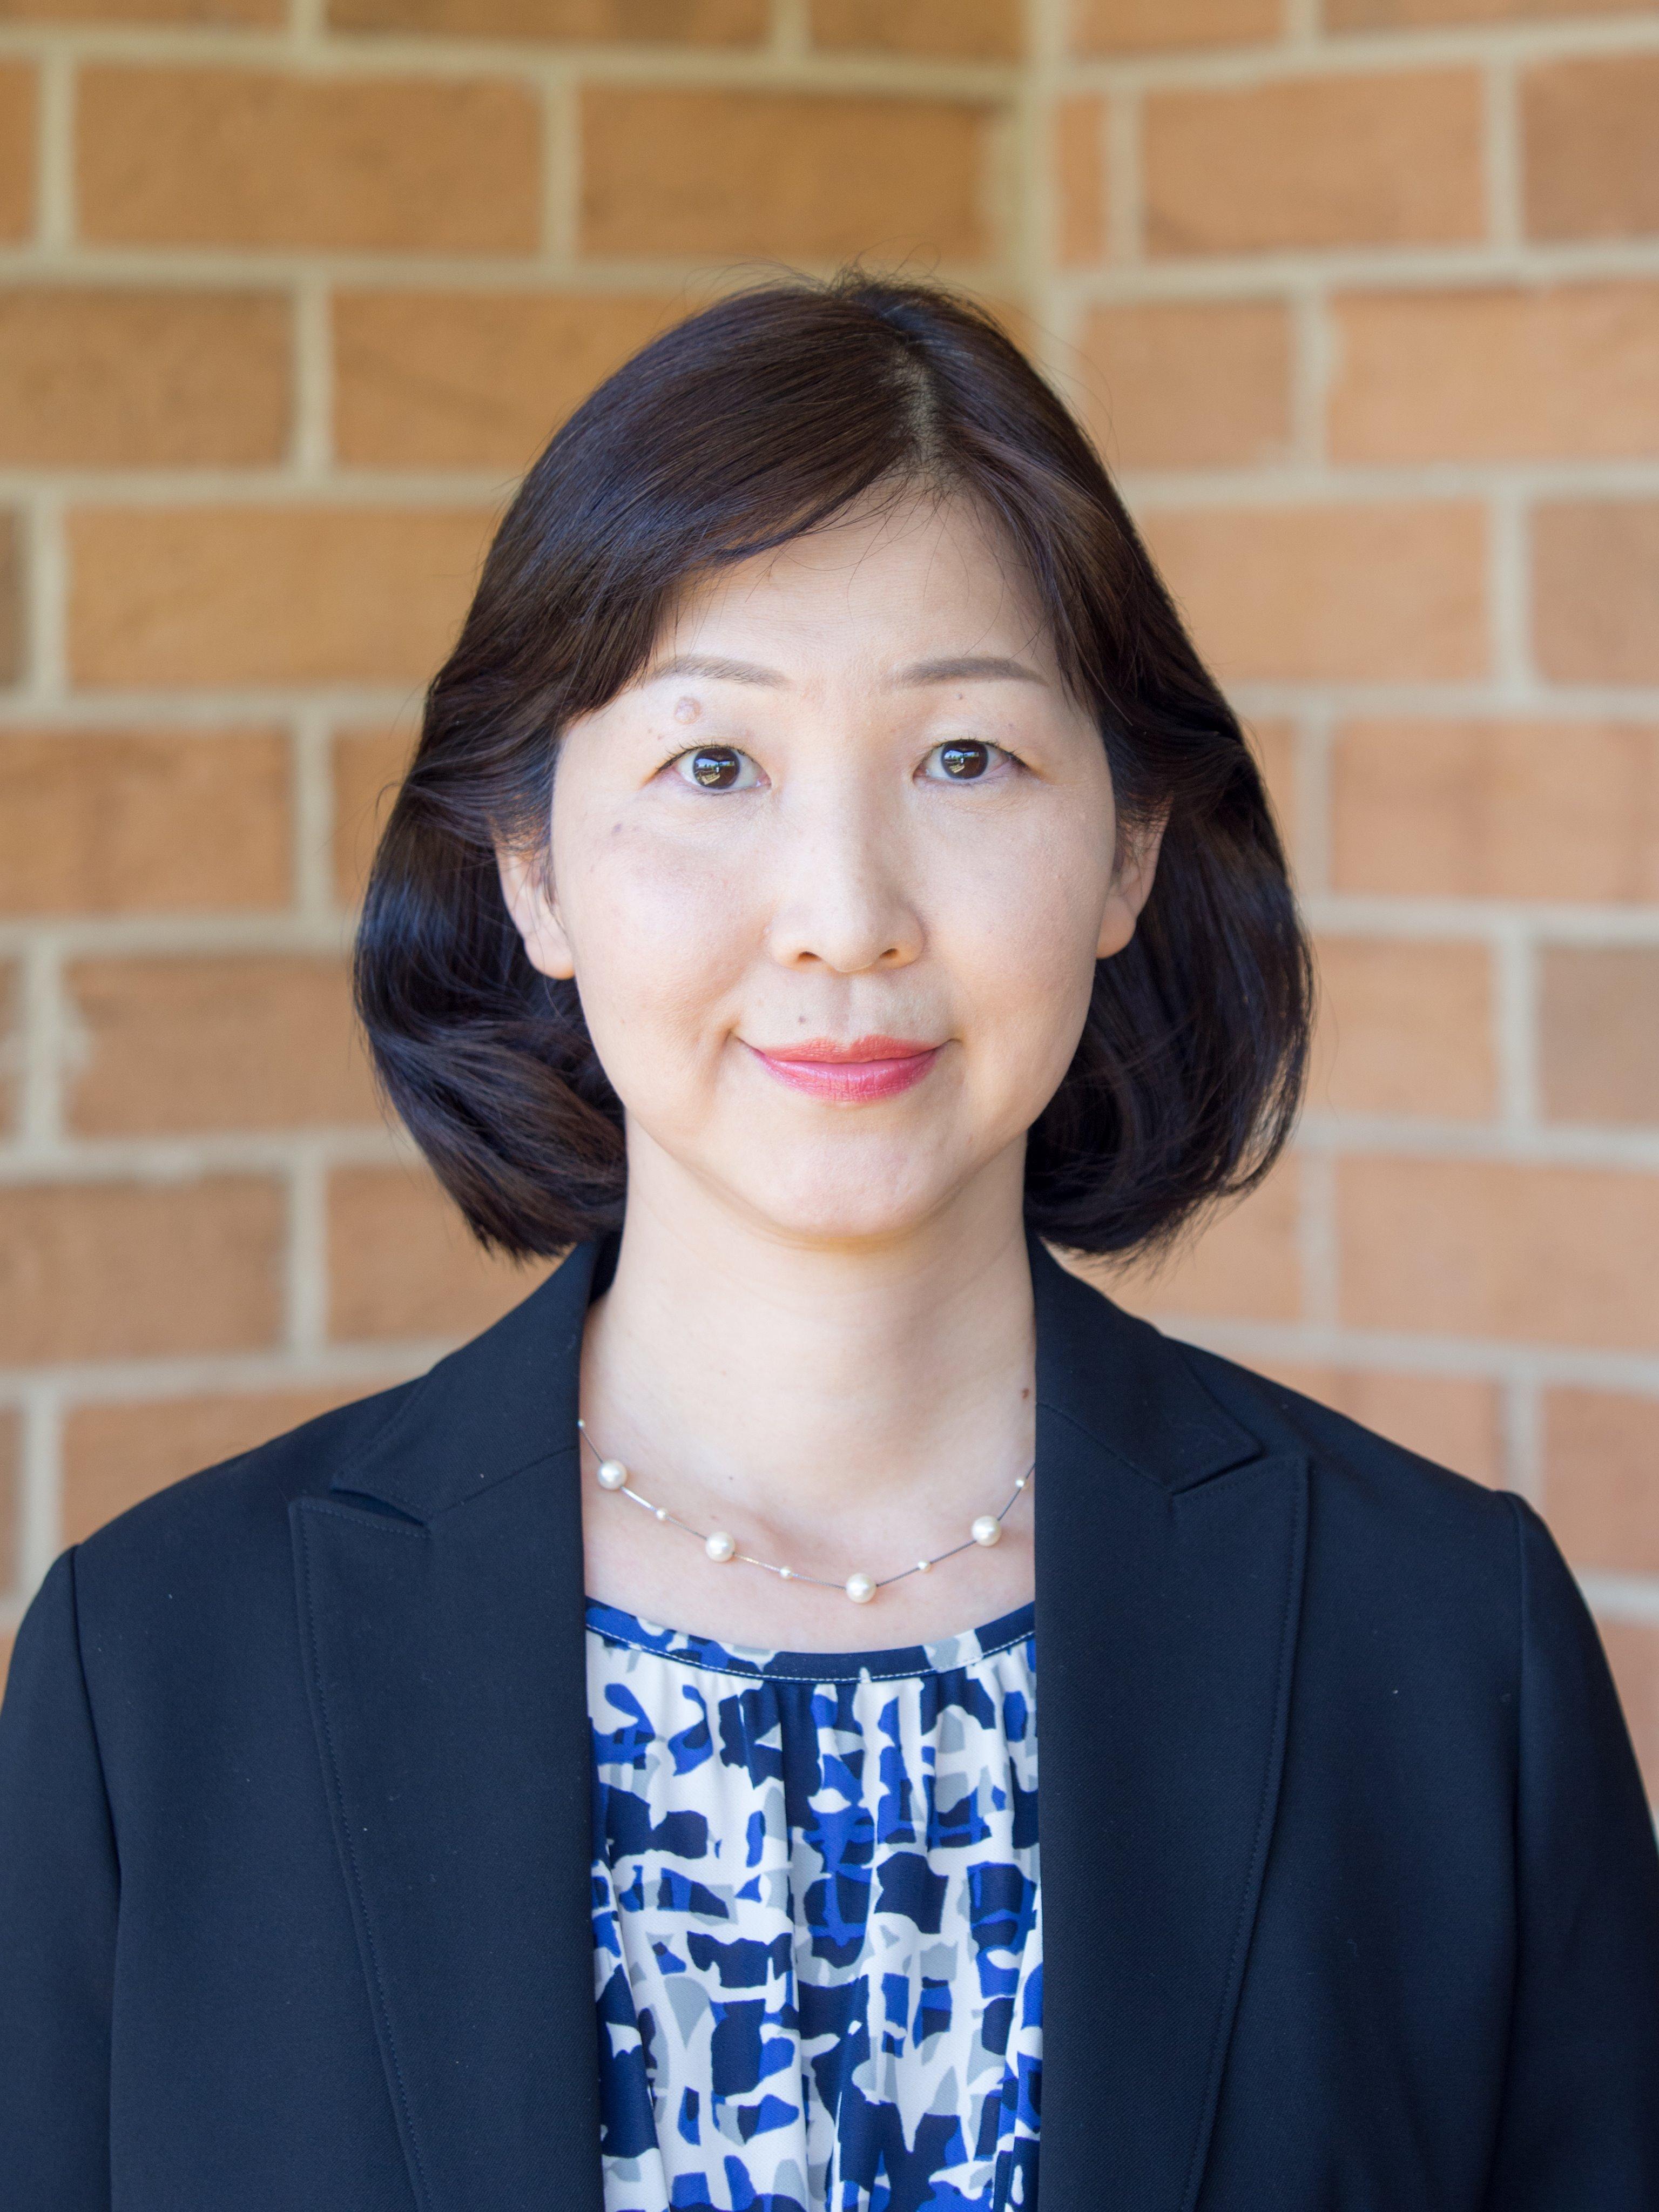 Profile picture of Nana Oishi